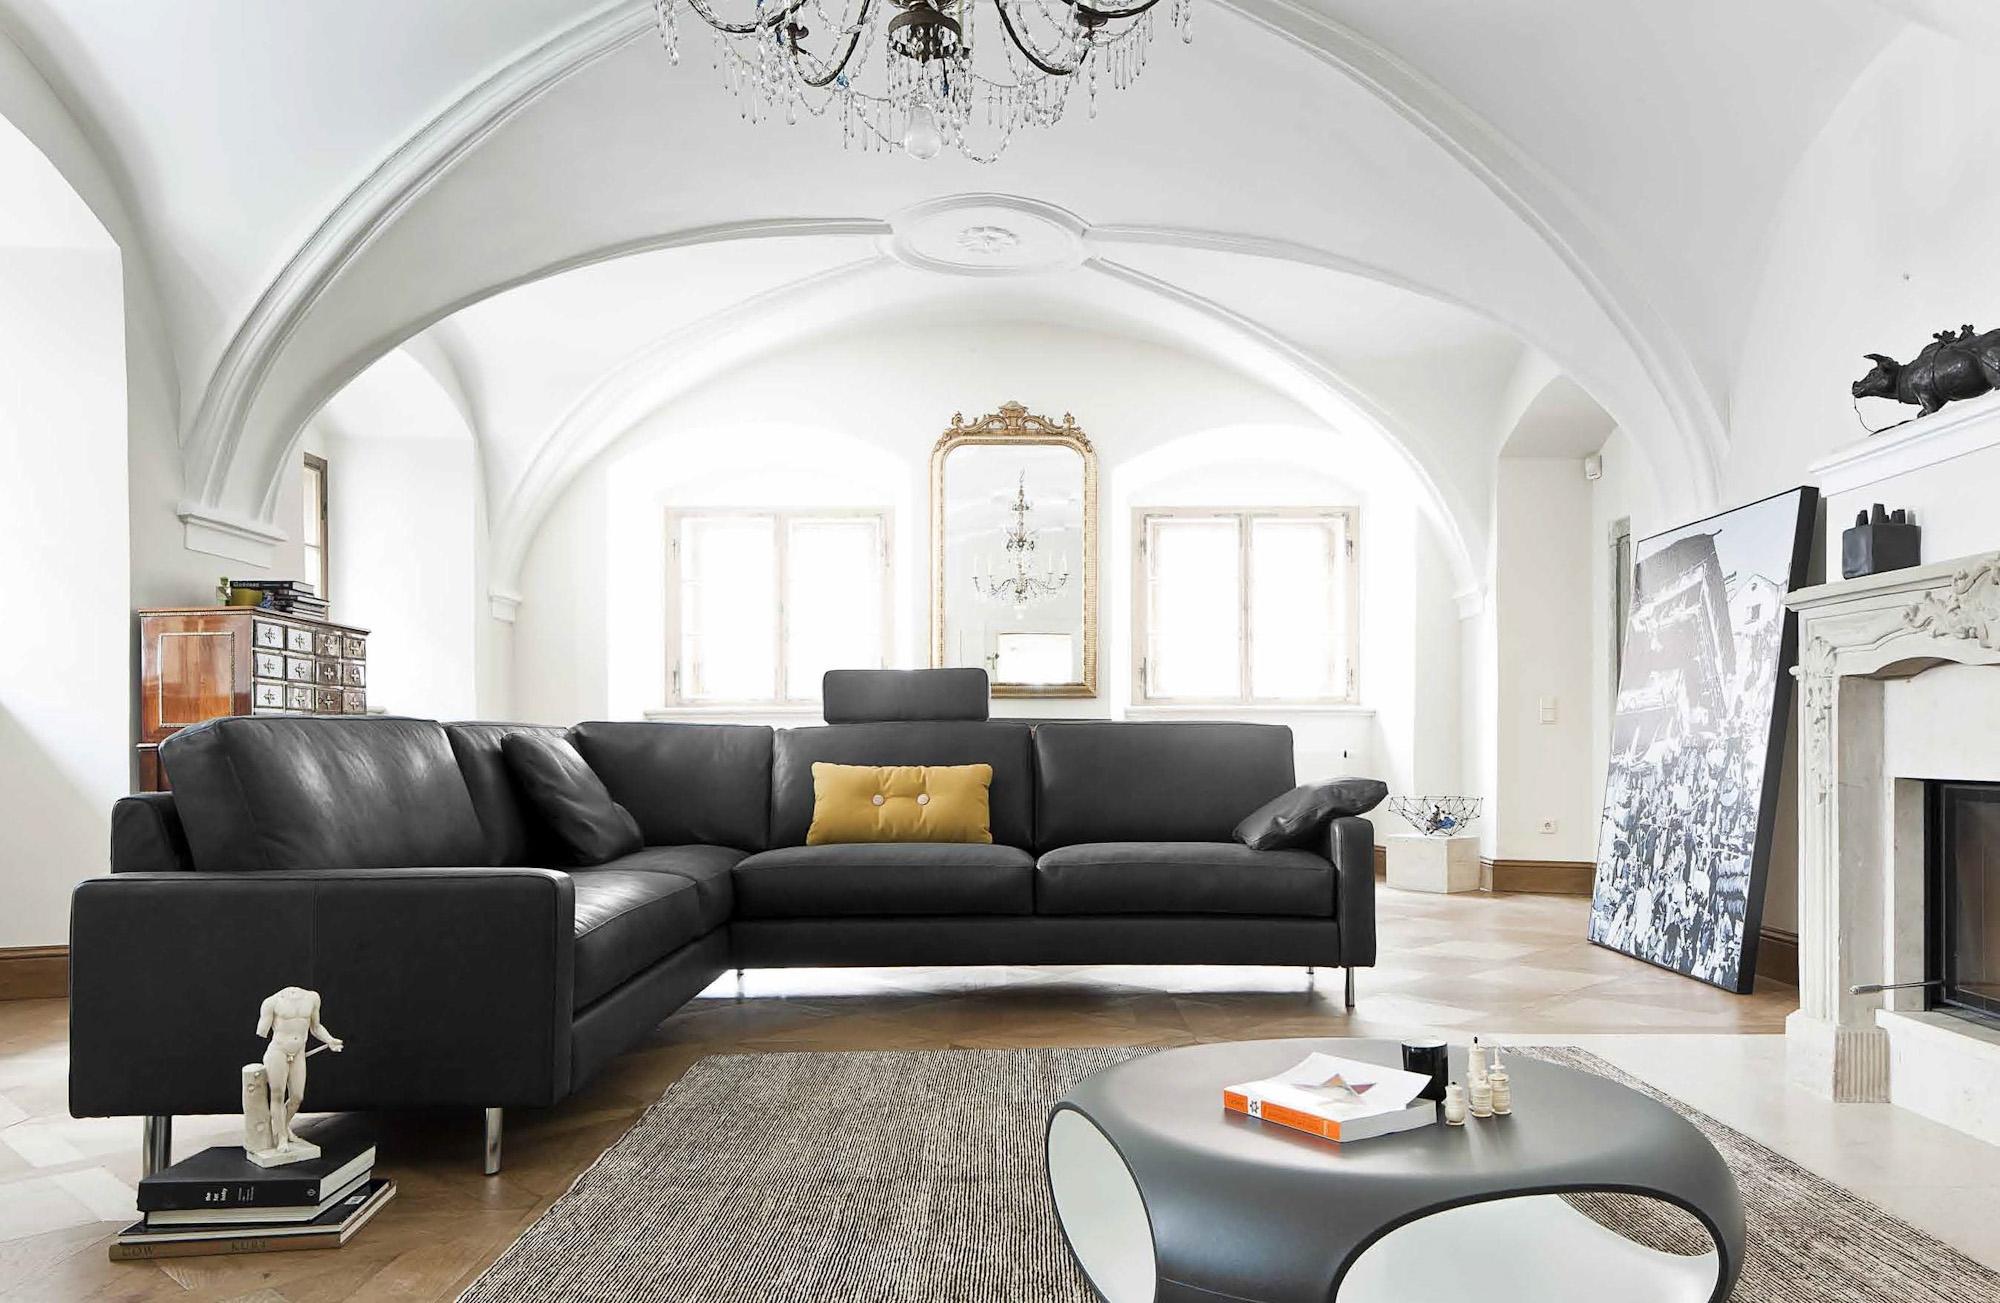 m bel morschett hochwertige massivholzm bel und naturholzm bel. Black Bedroom Furniture Sets. Home Design Ideas